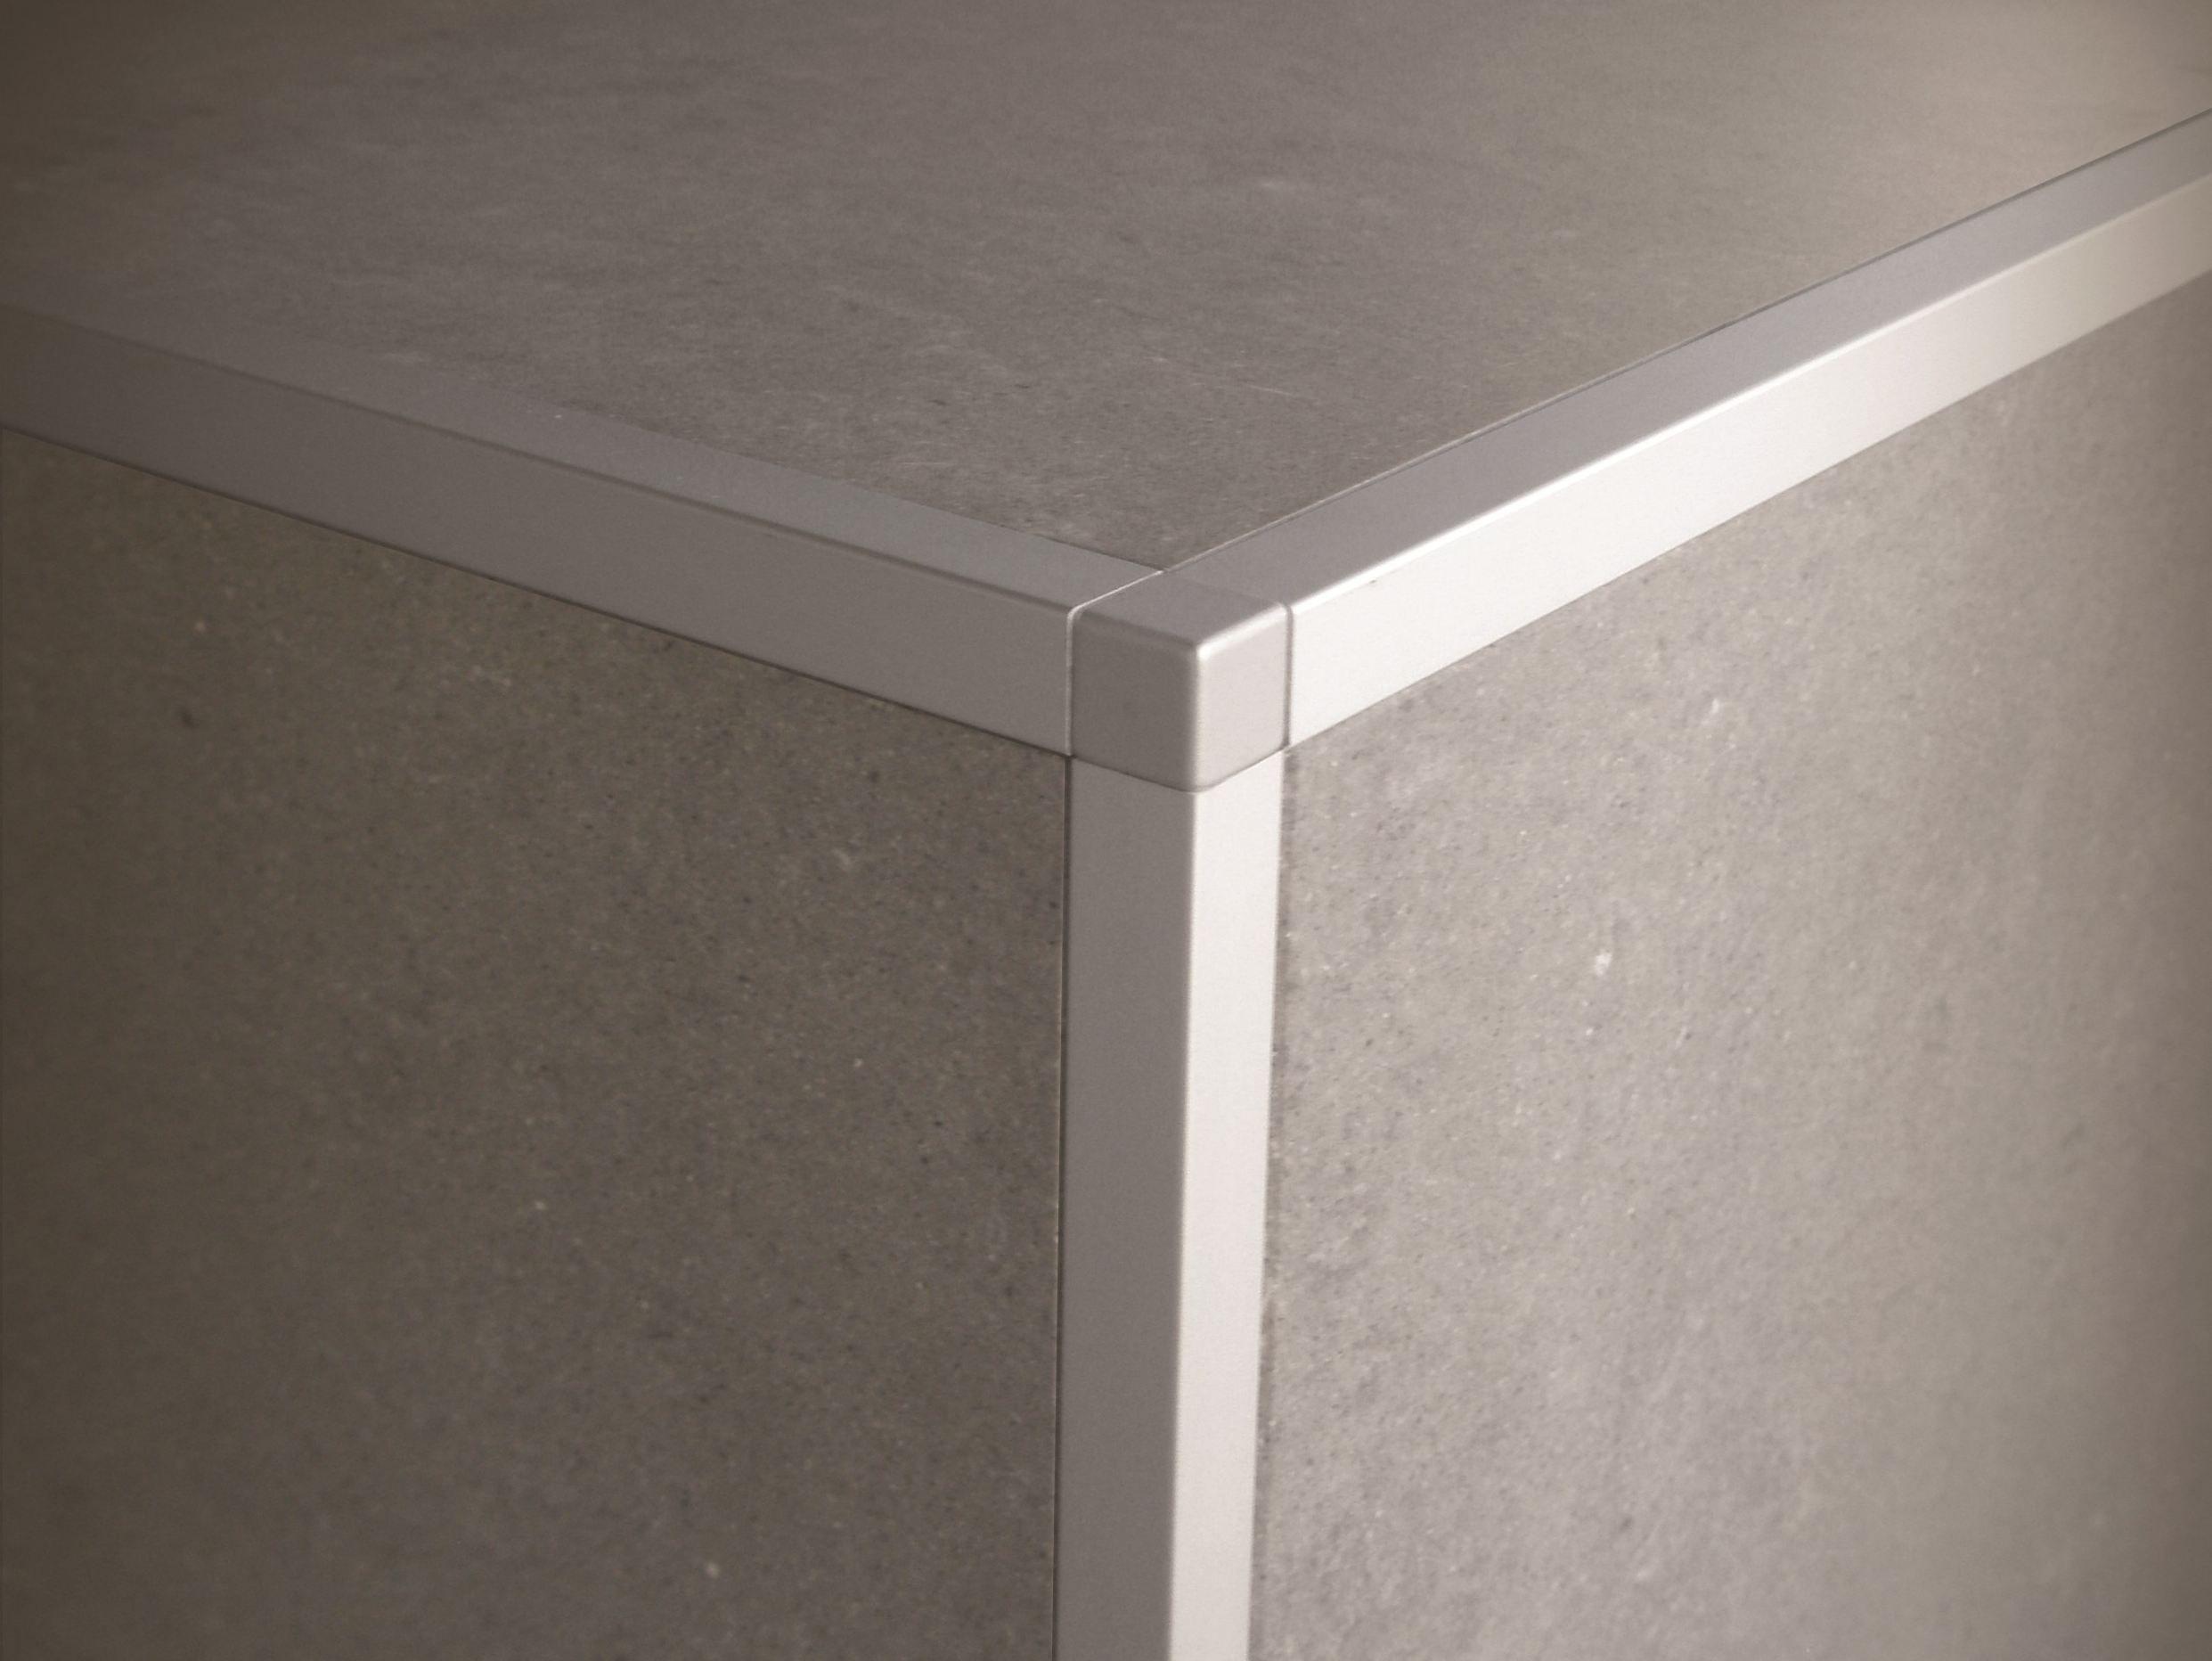 Multipurpose Profiles For Ceramic Tile Coverings